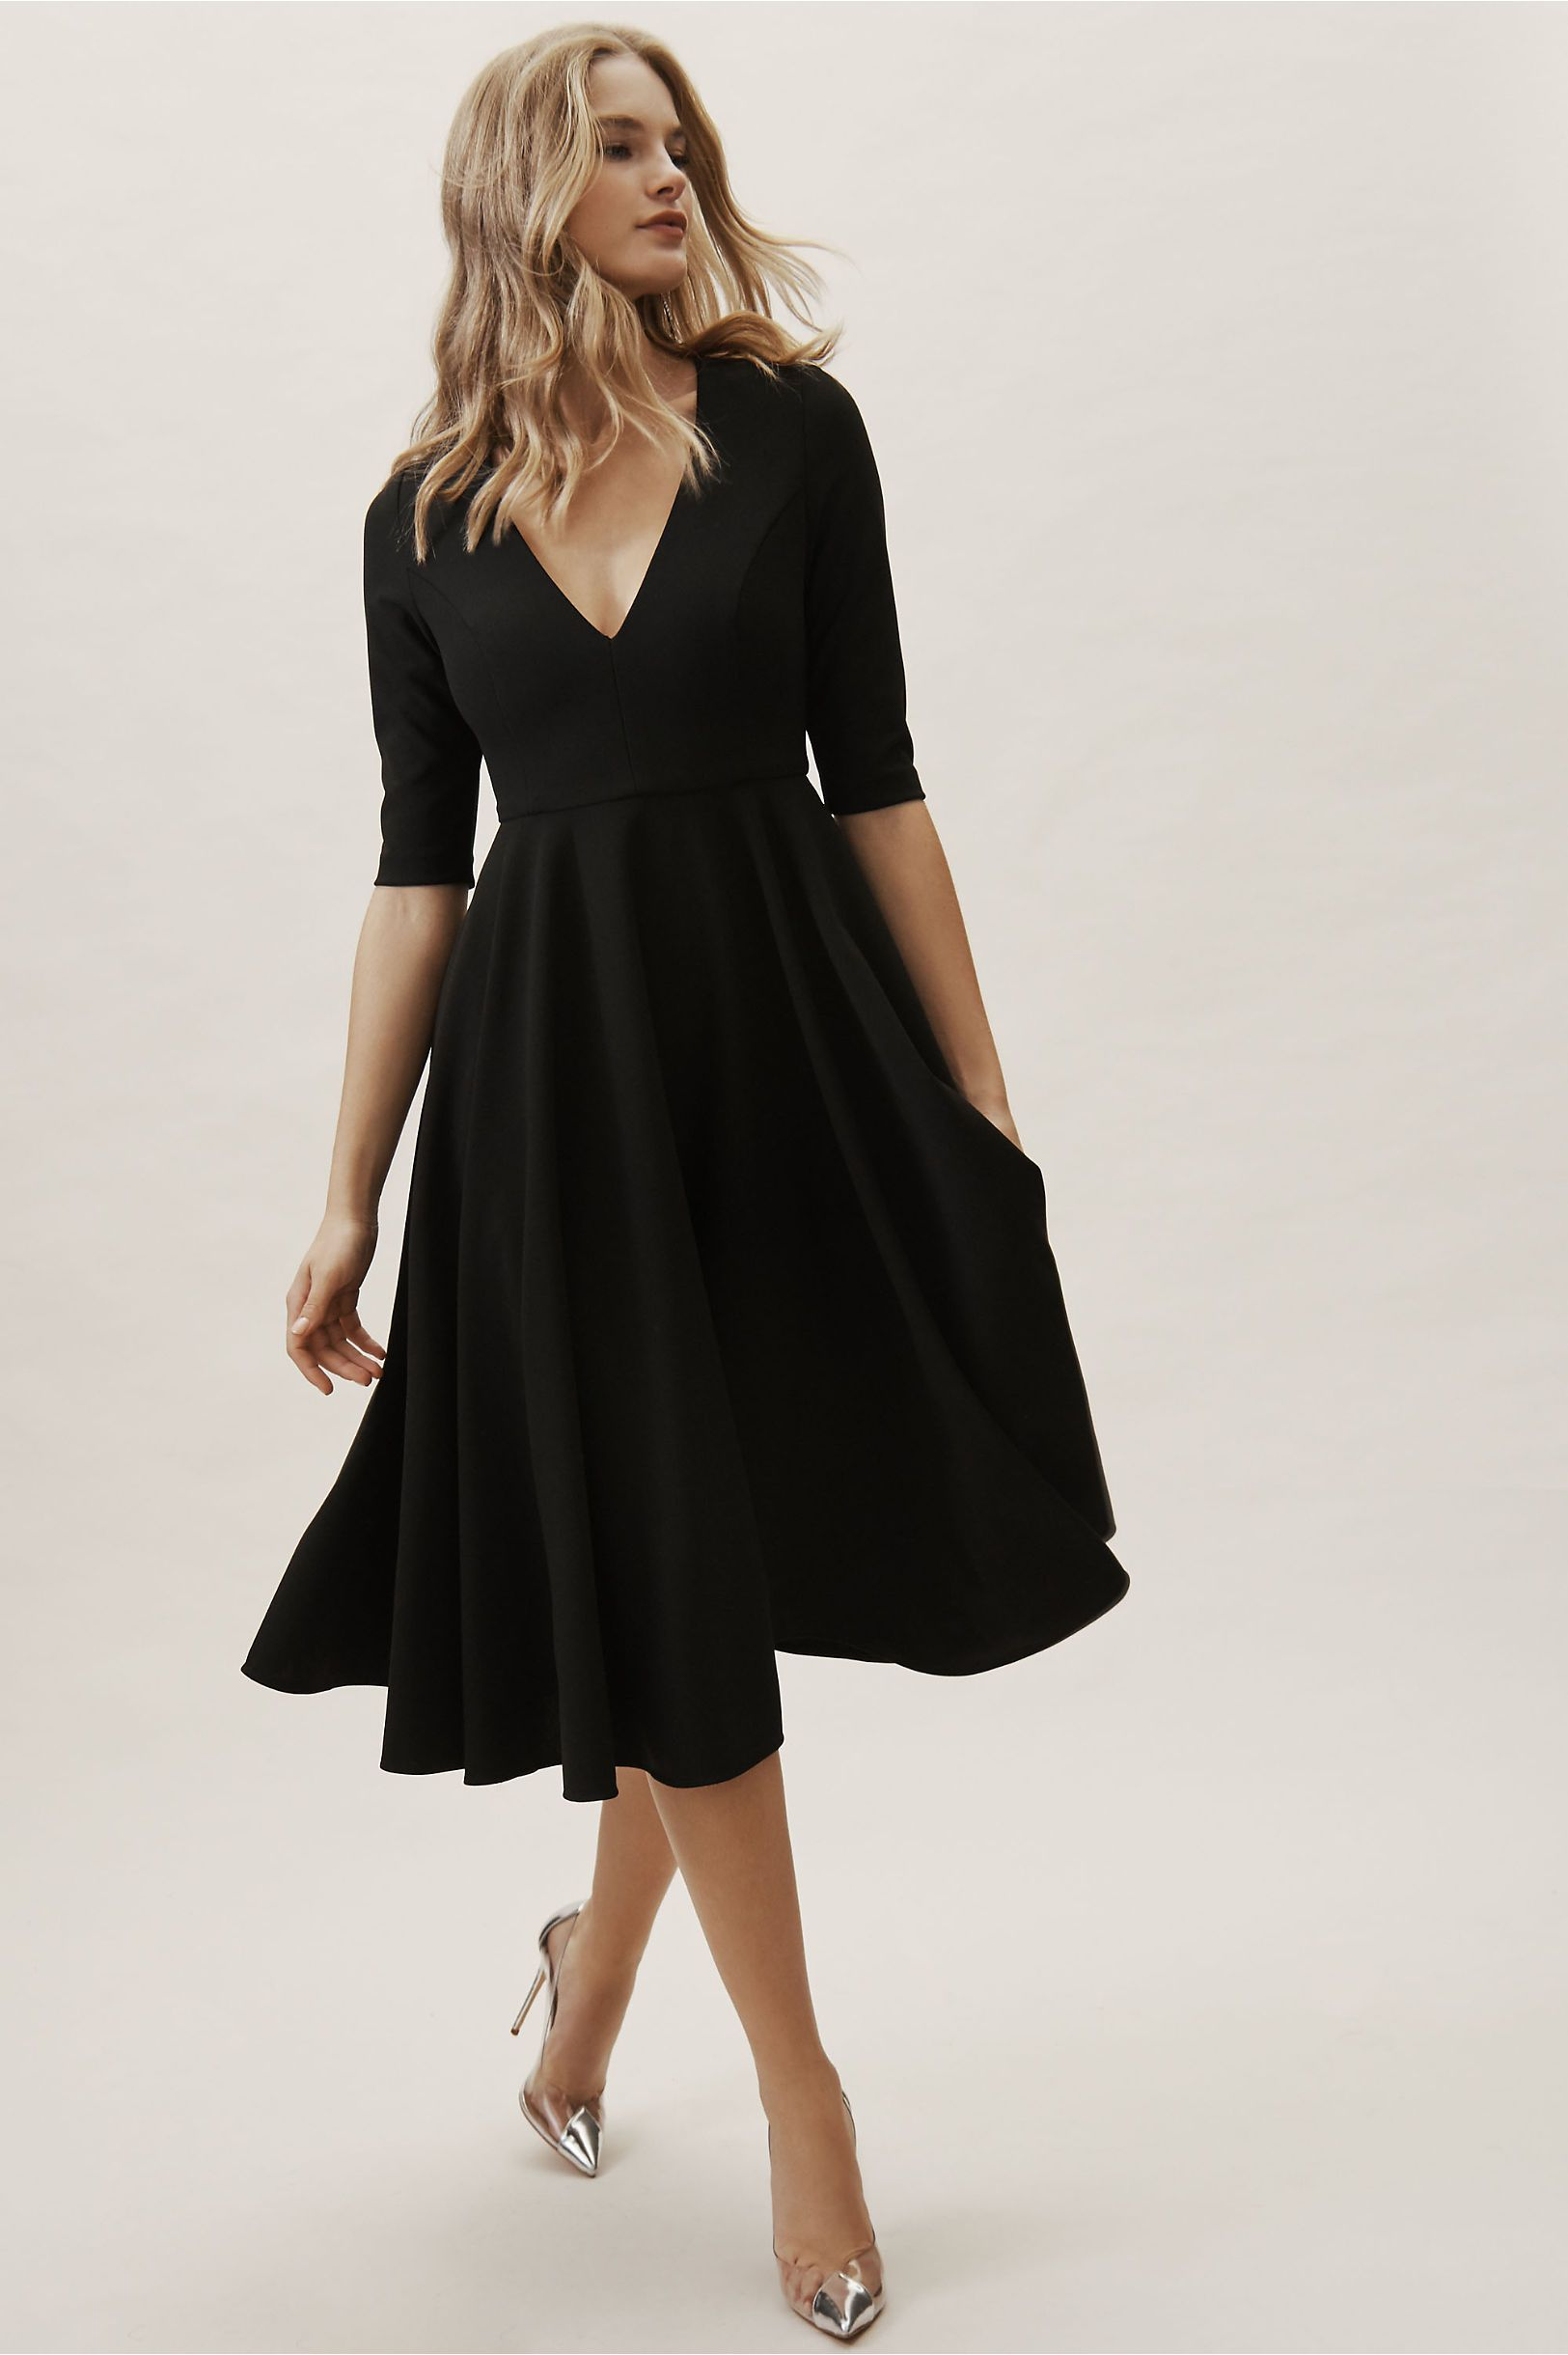 08ae69fa305 BHLDN s Valdis Dress in Black